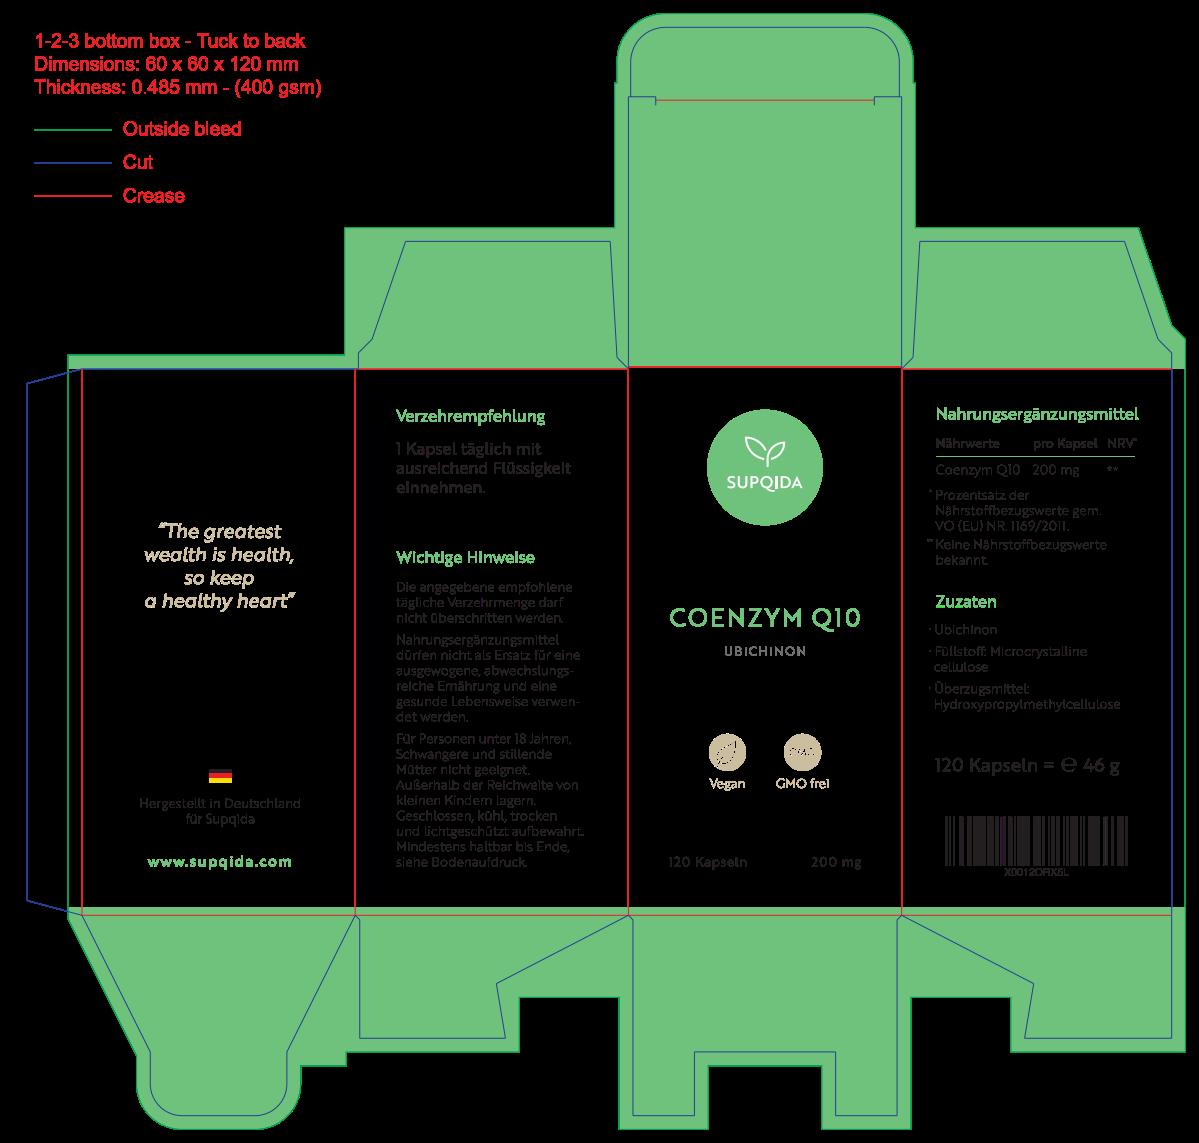 Design packaging box - Dietary supplement